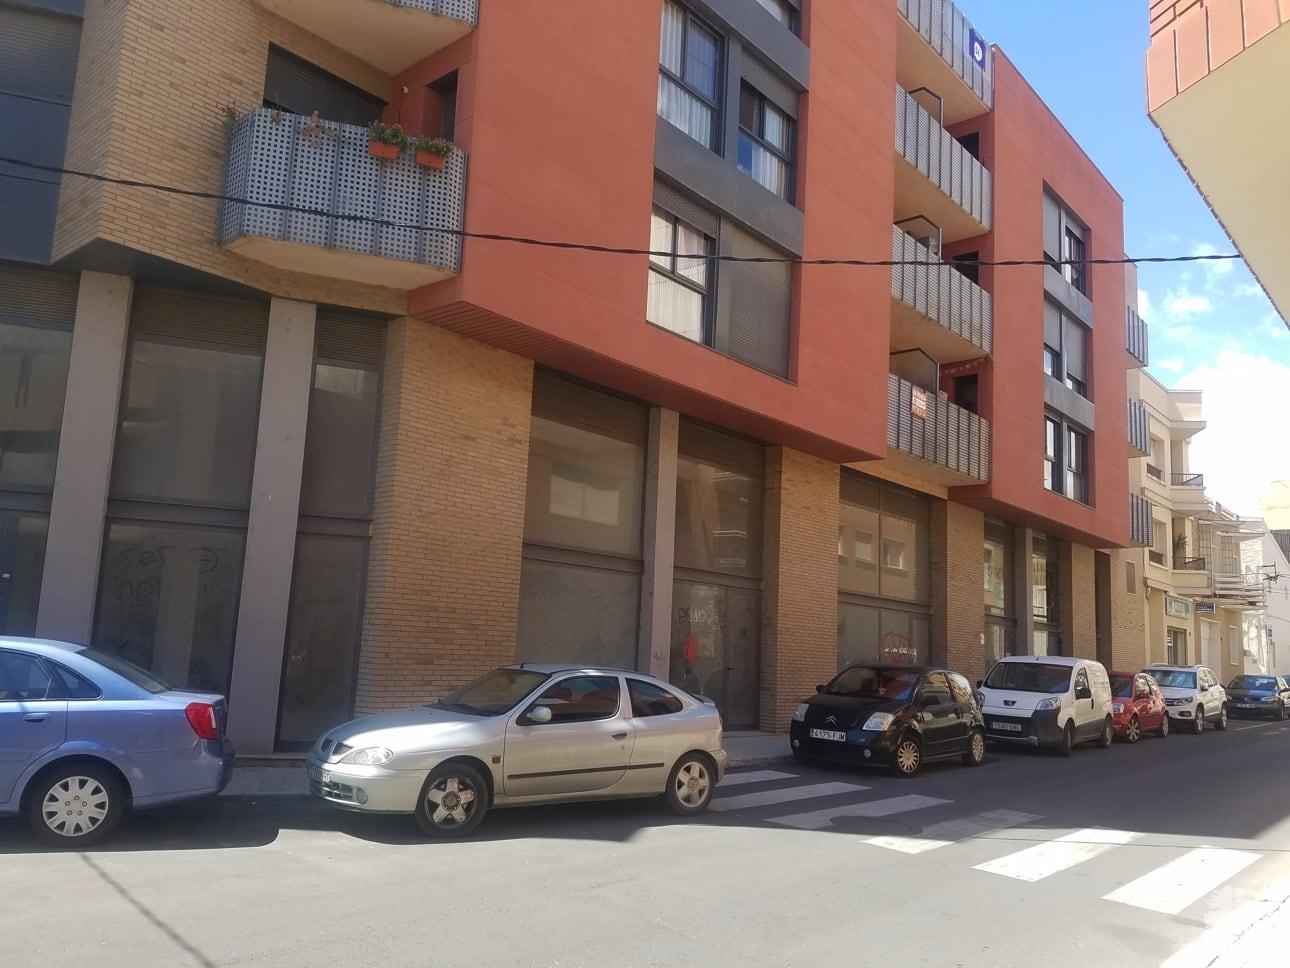 Local en venta en Mas de Miralles, Amposta, Tarragona, Calle Torreta, 121.000 €, 214 m2